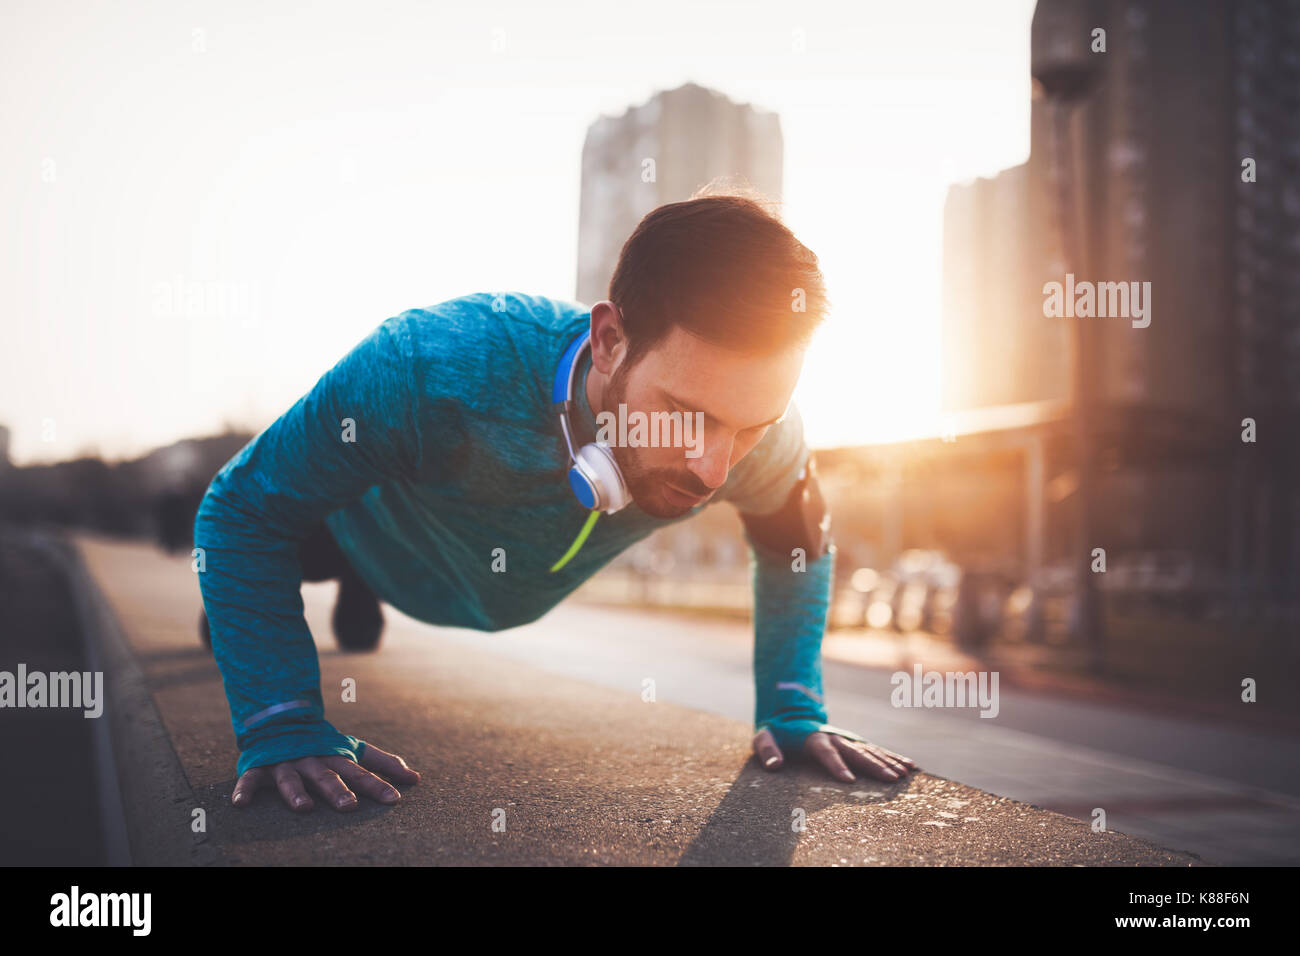 Schöner Mann urban Training im Sonnenuntergang Stockbild